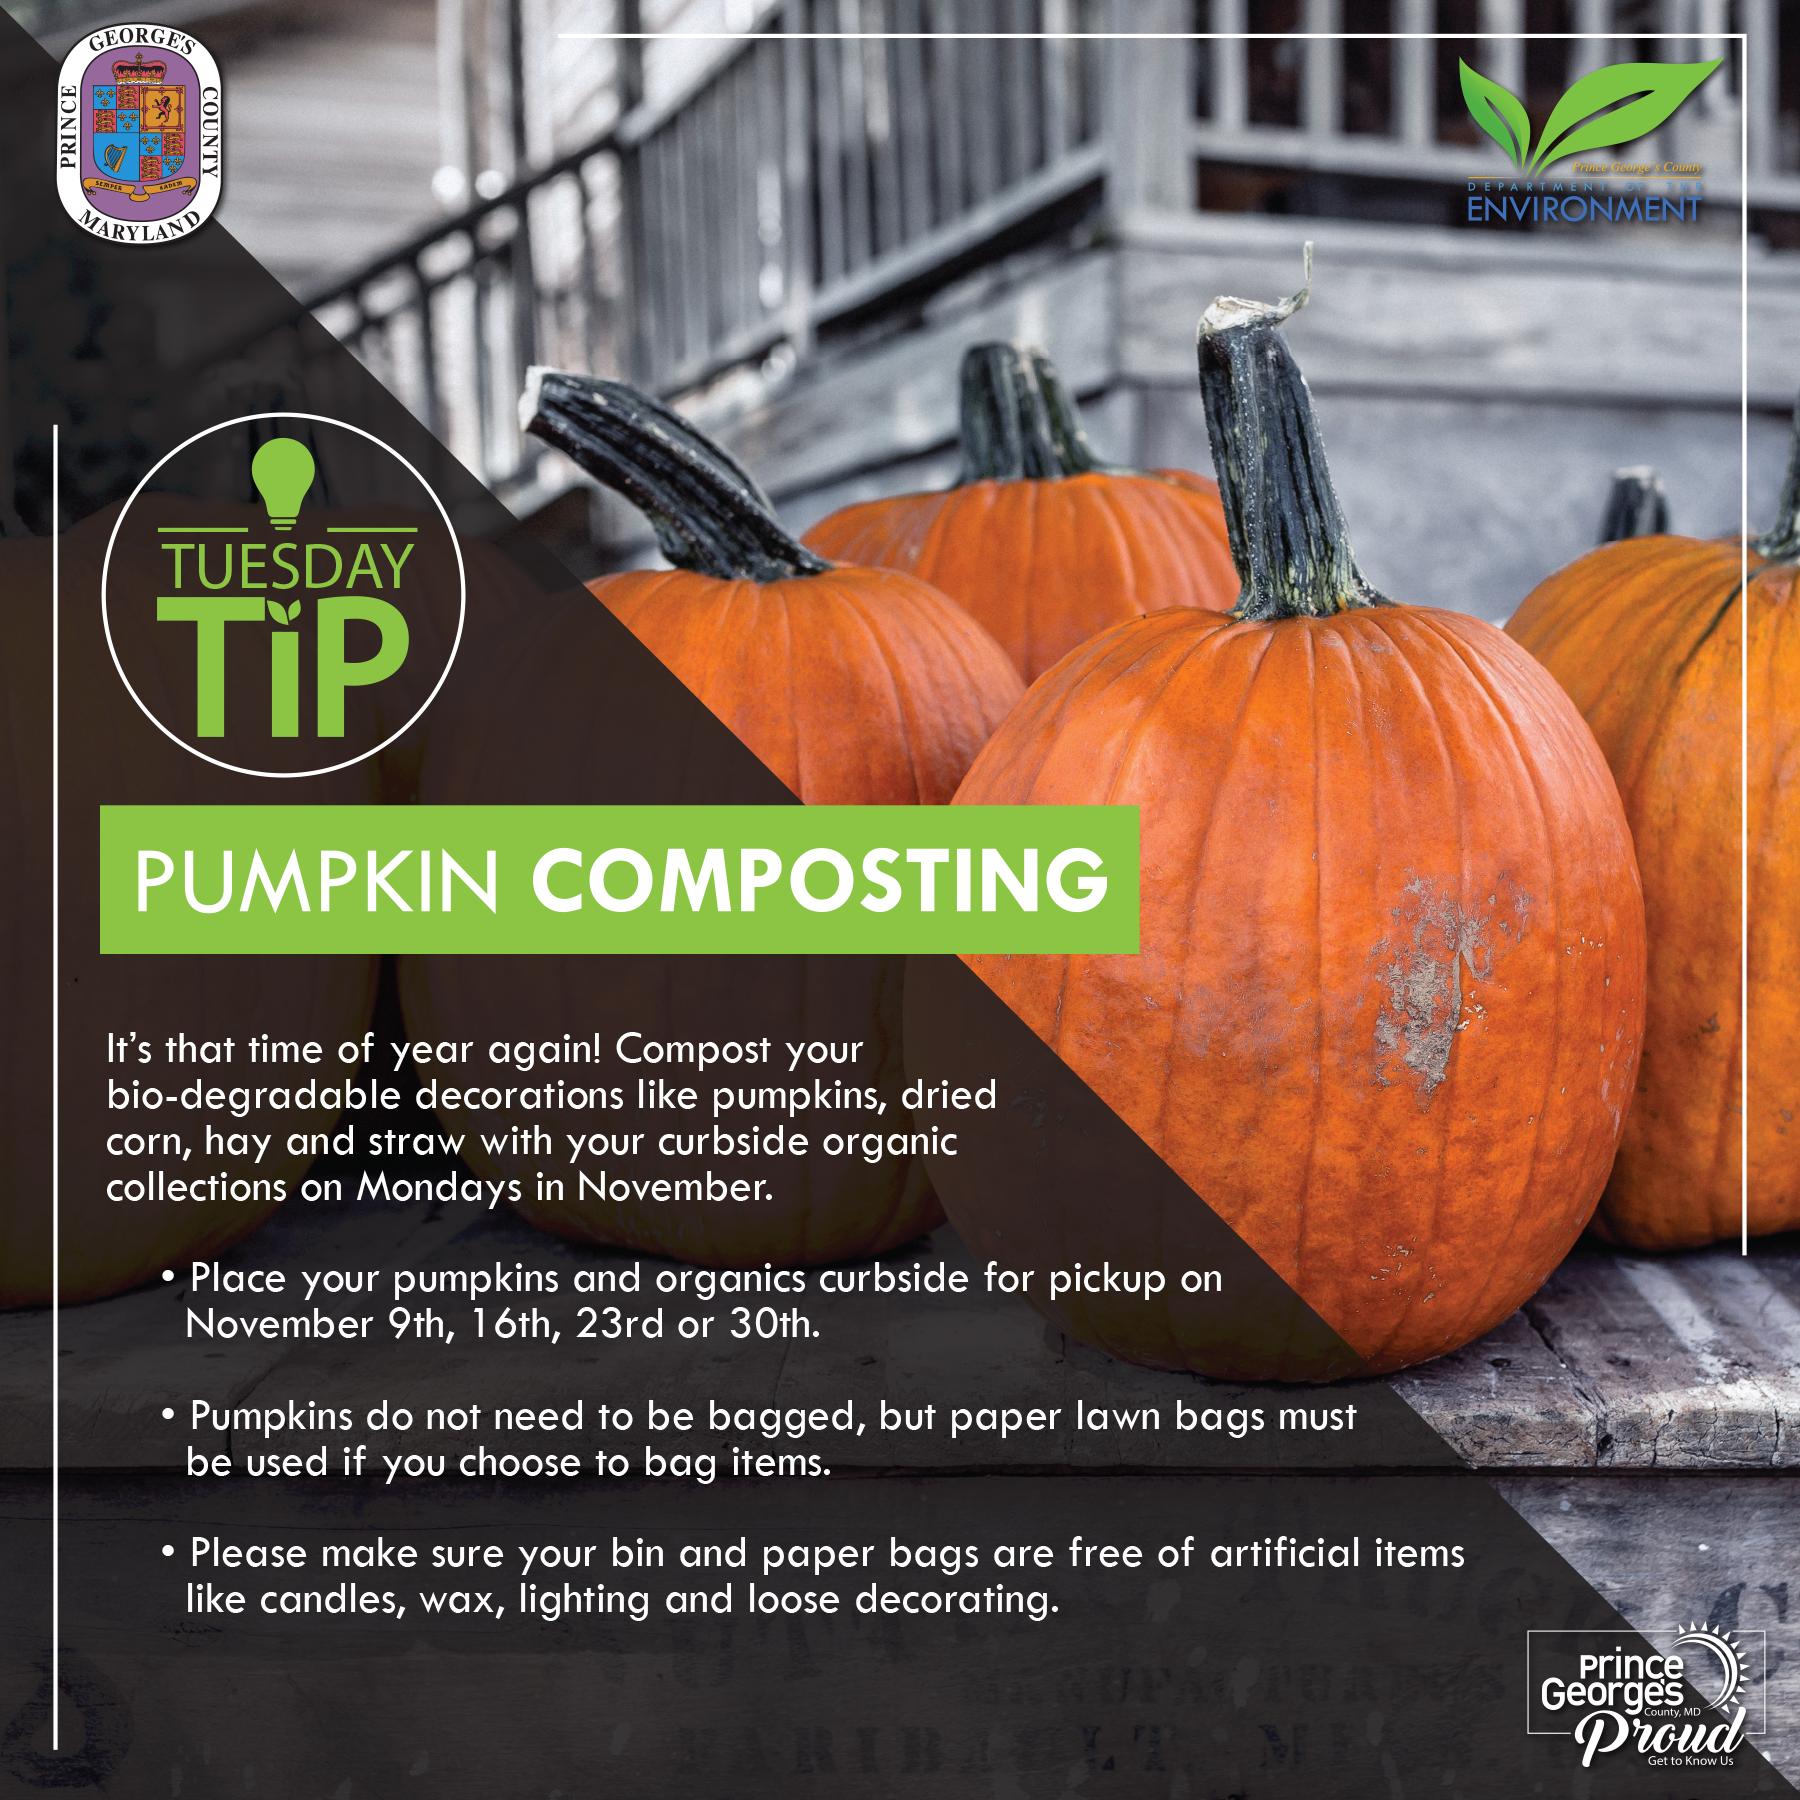 Tues Tip 11.3.20 Pumpkin Composting eng